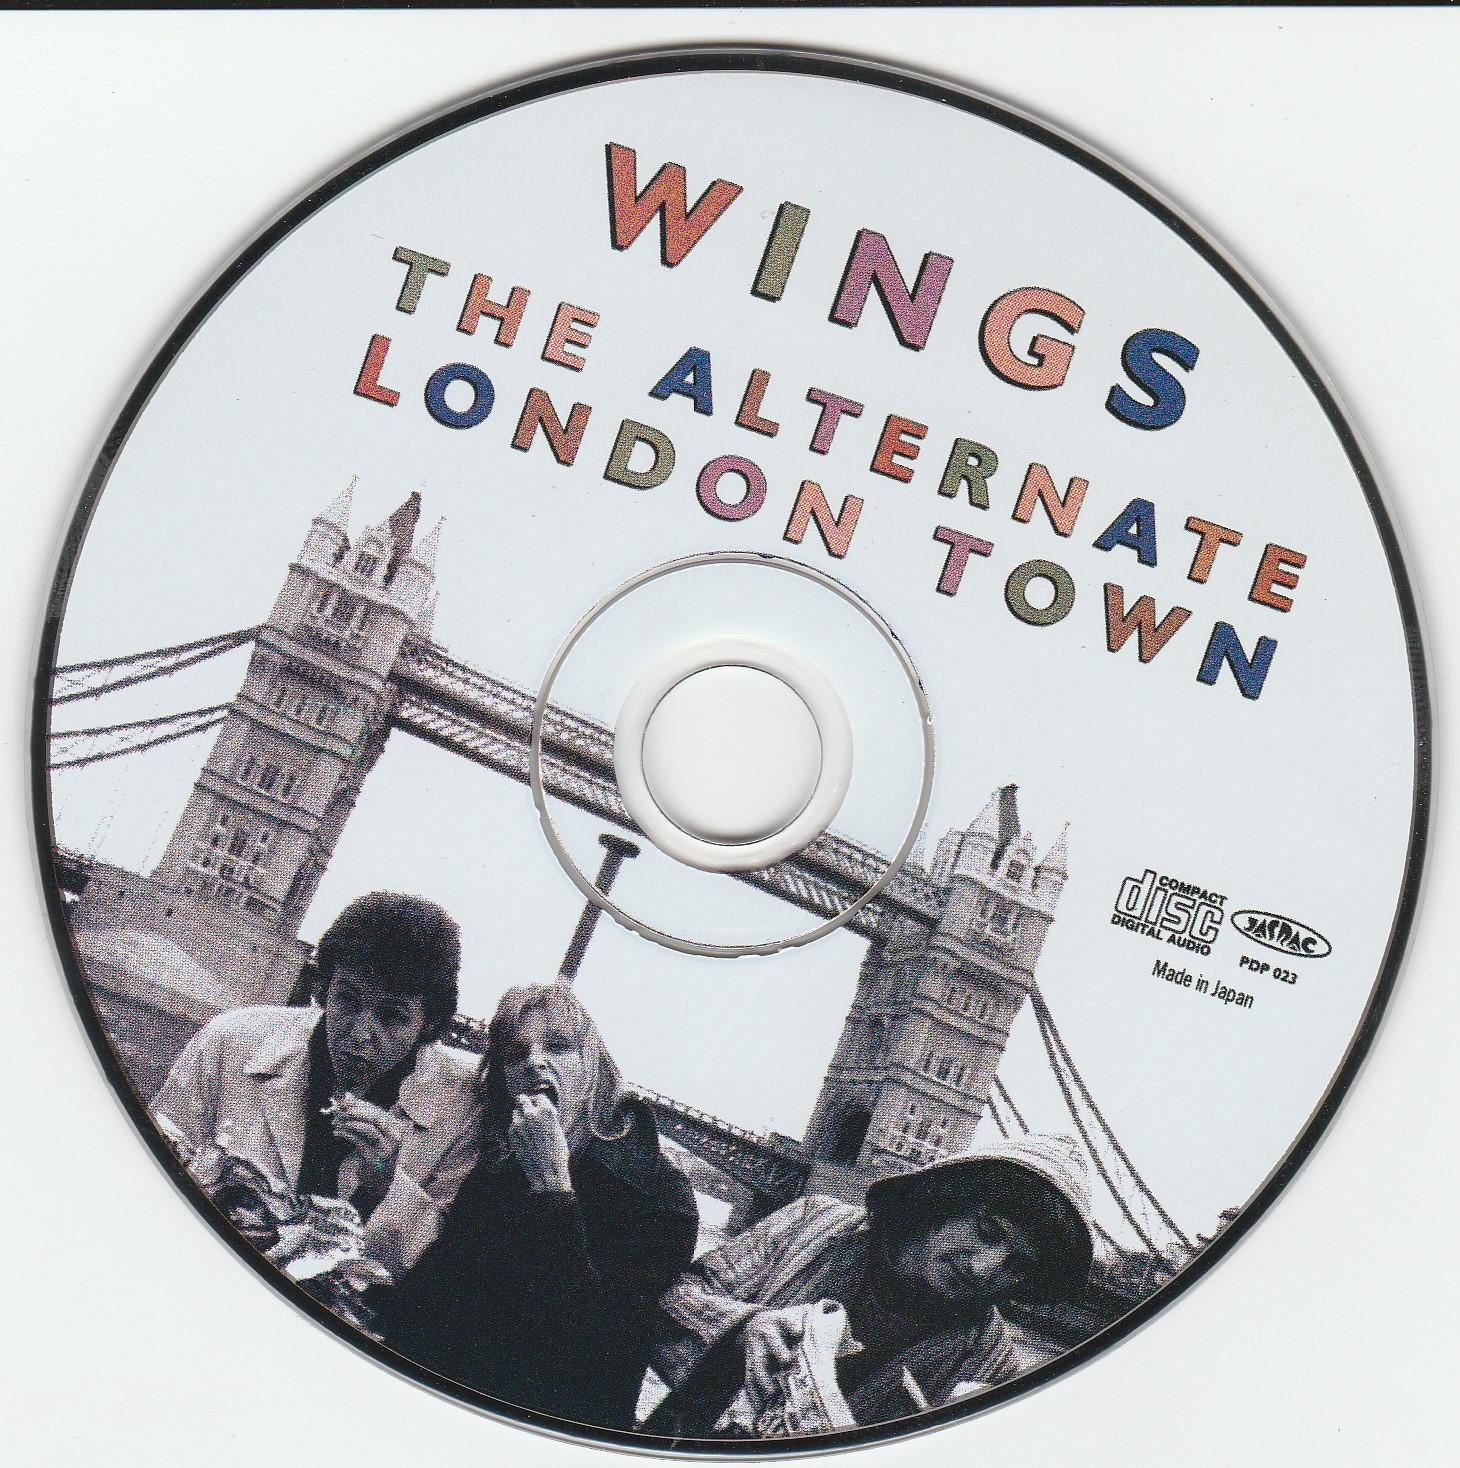 Las Galletas de Maria: Wings - The Alternate London Town (2002 UK)